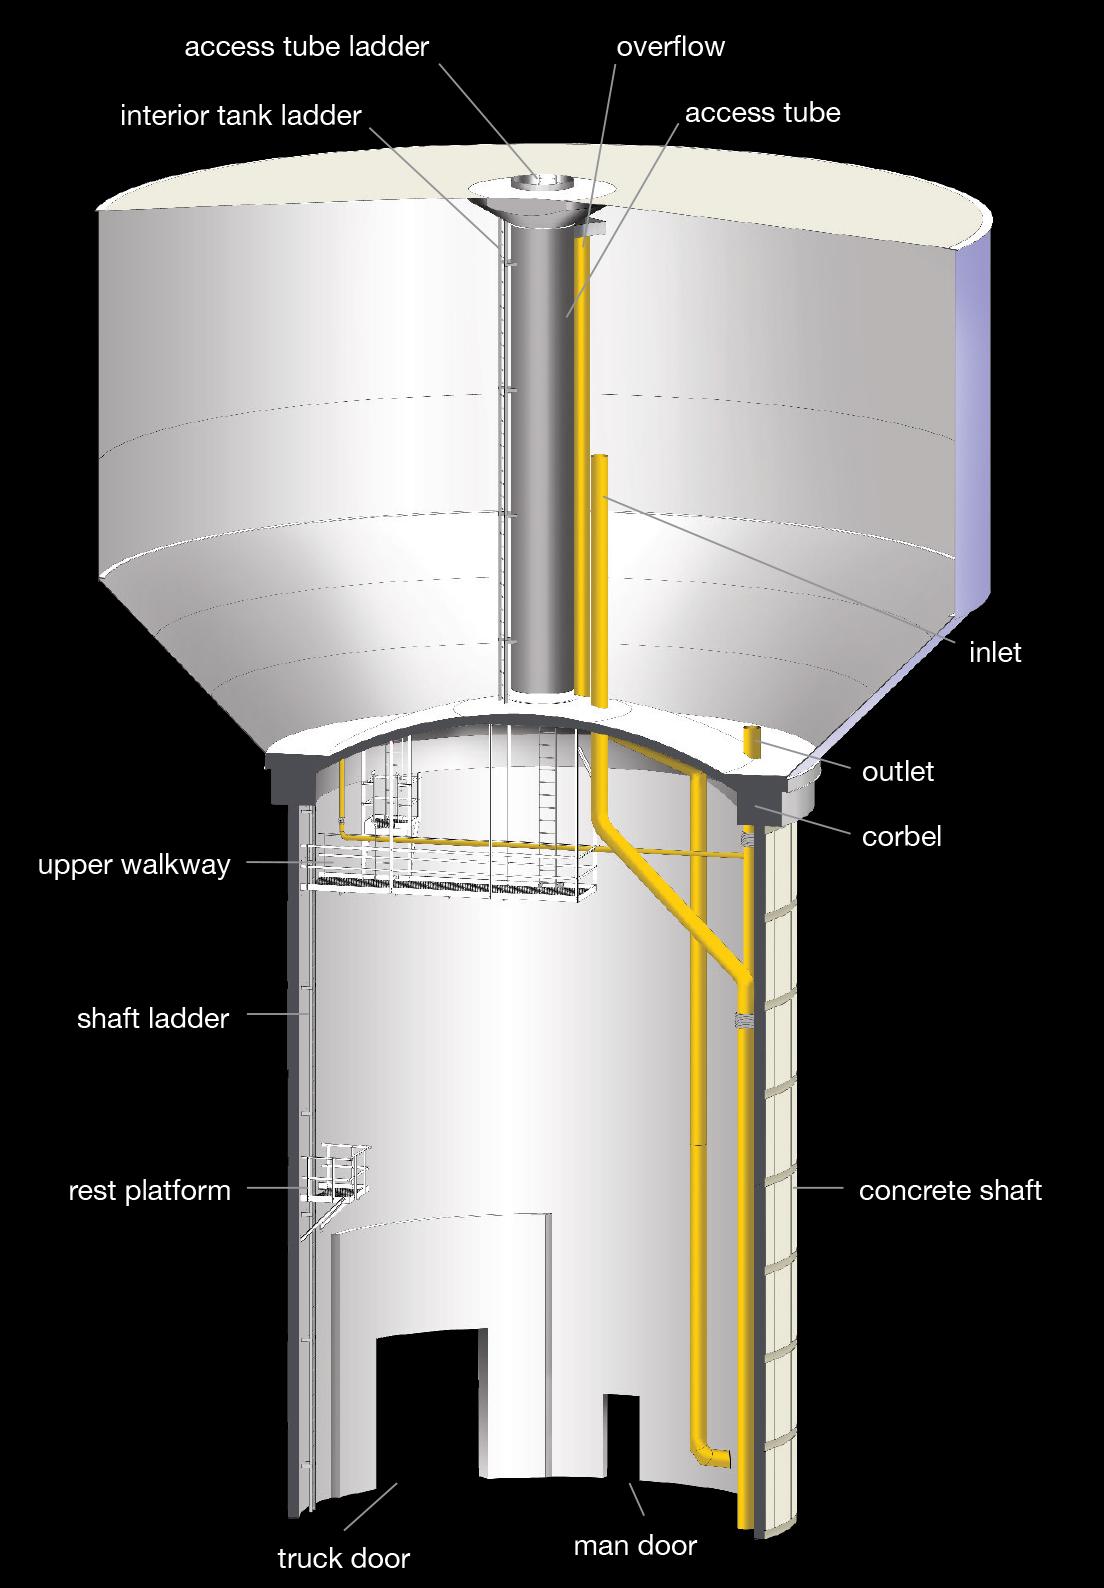 Knowles Road Water Tower